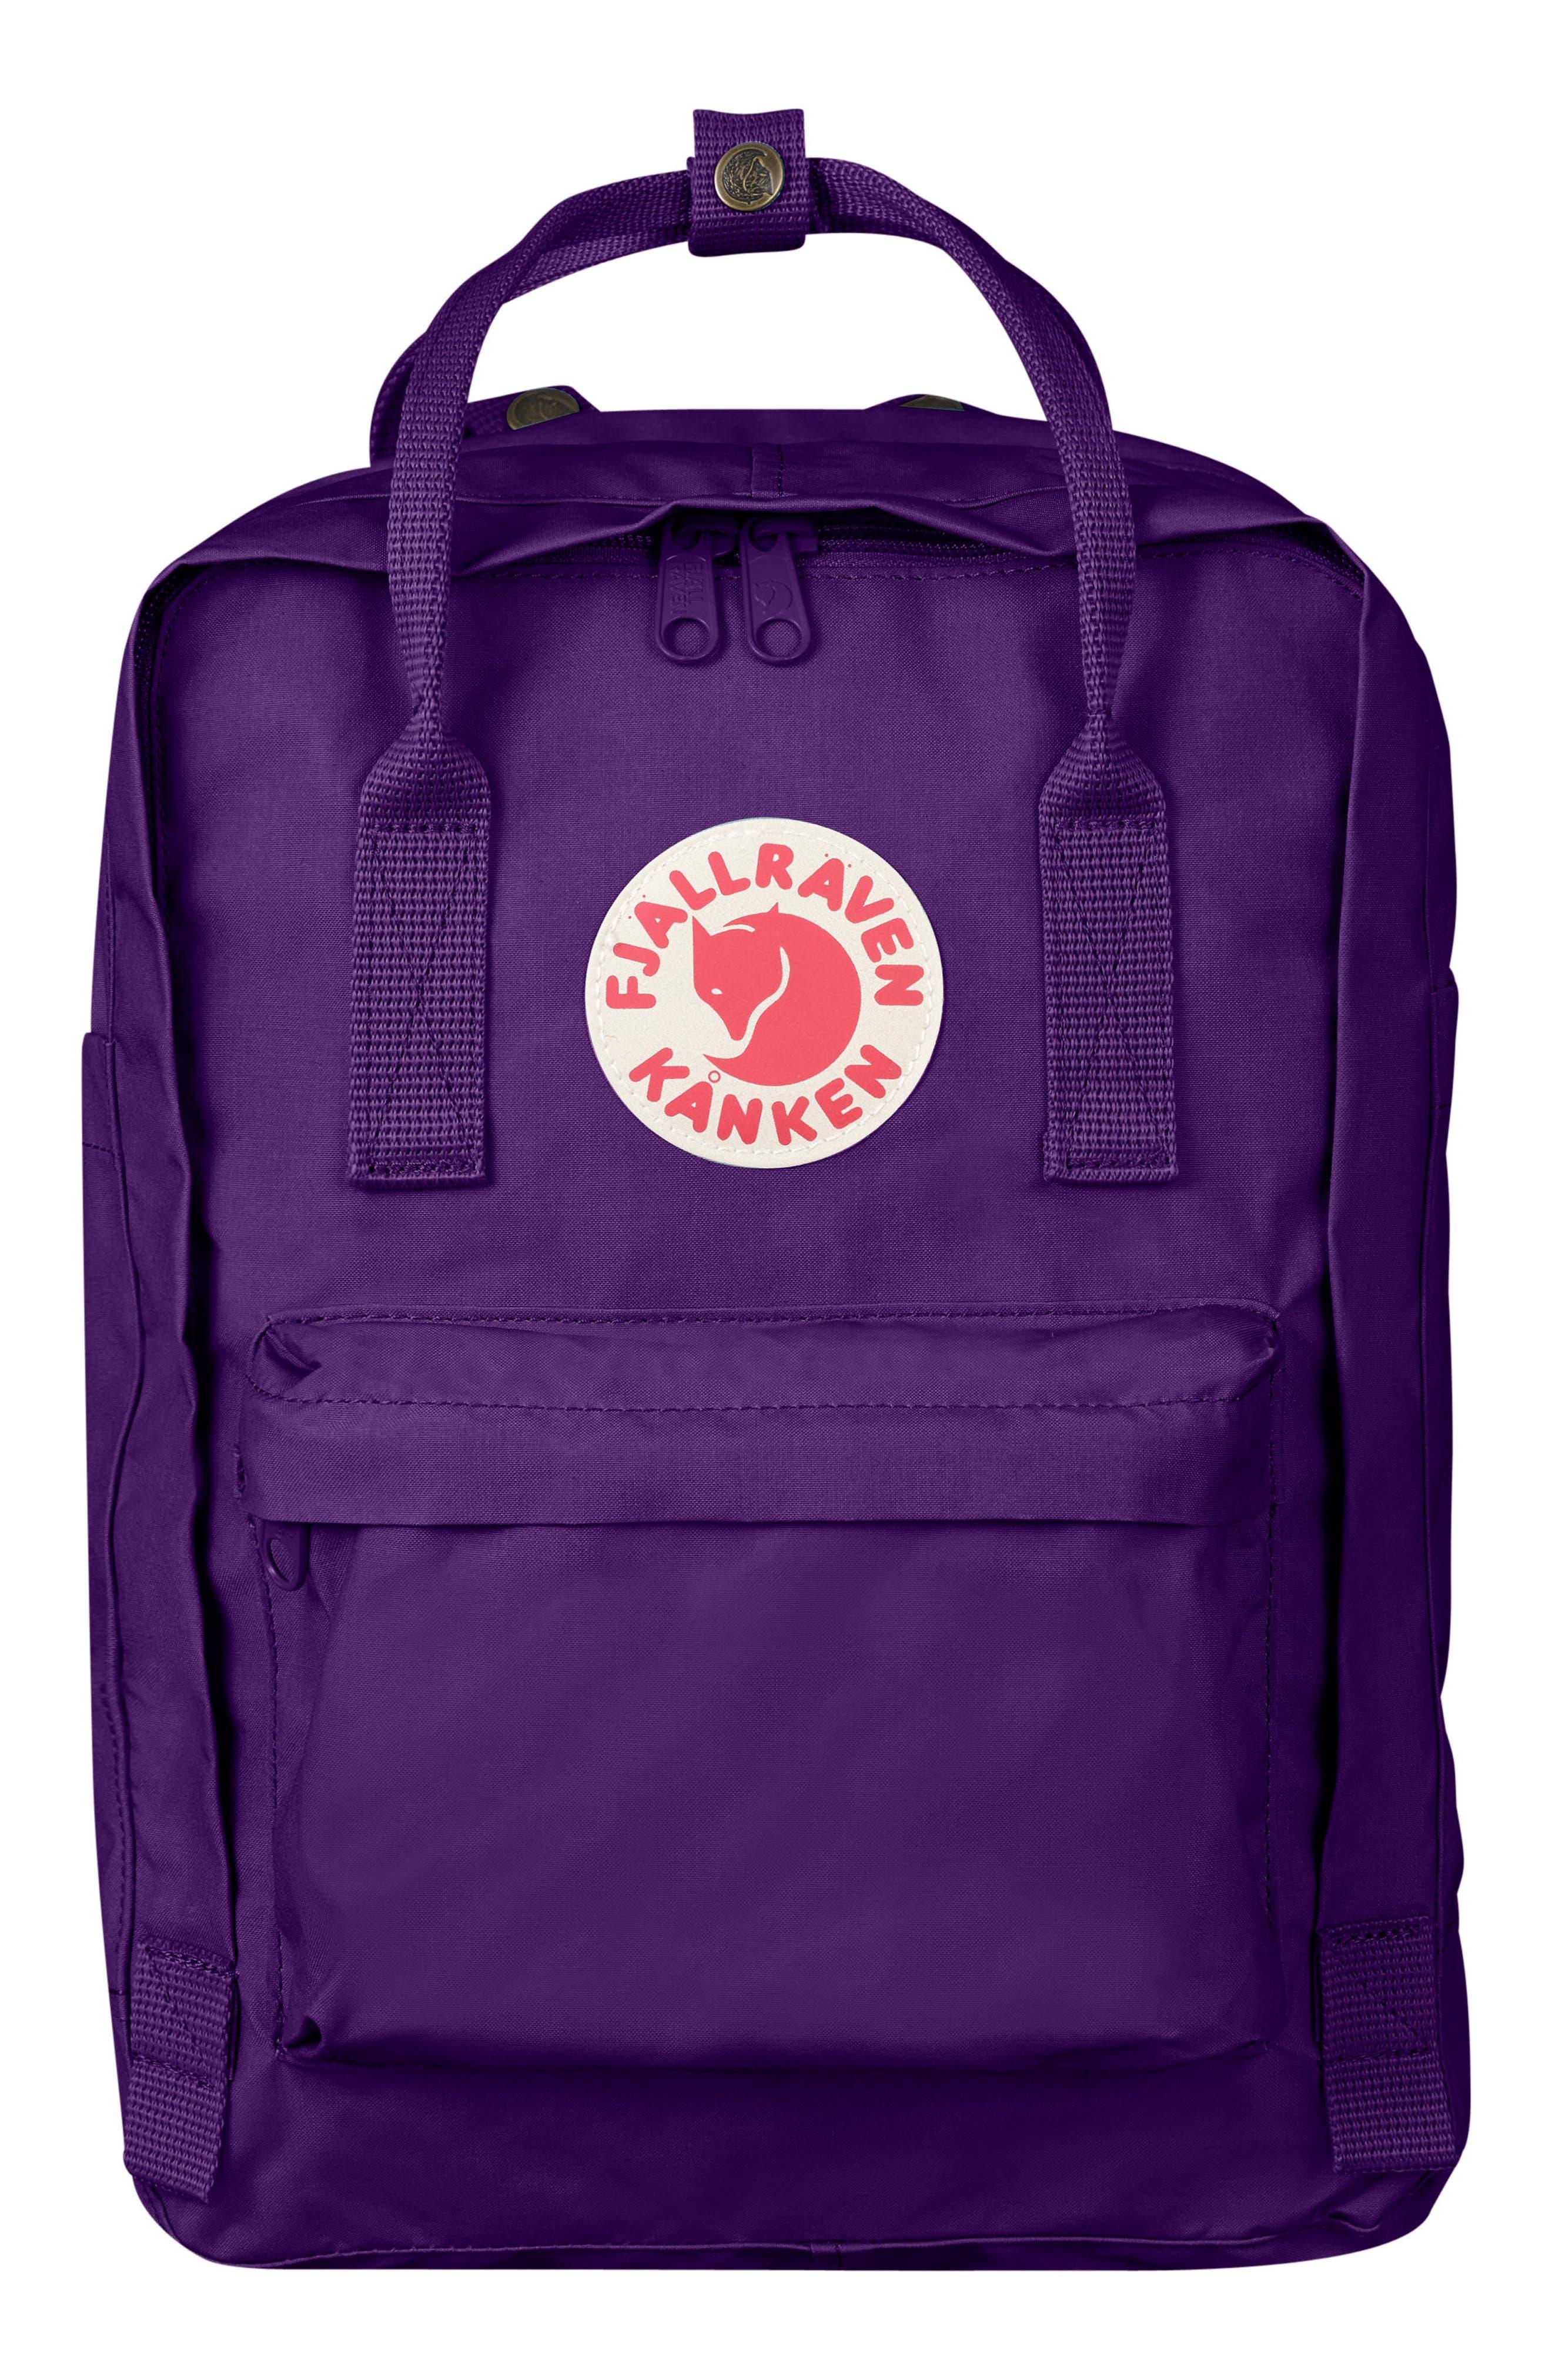 FJÄLLRÄVEN, 'Kånken' Laptop Backpack, Main thumbnail 1, color, PURPLE